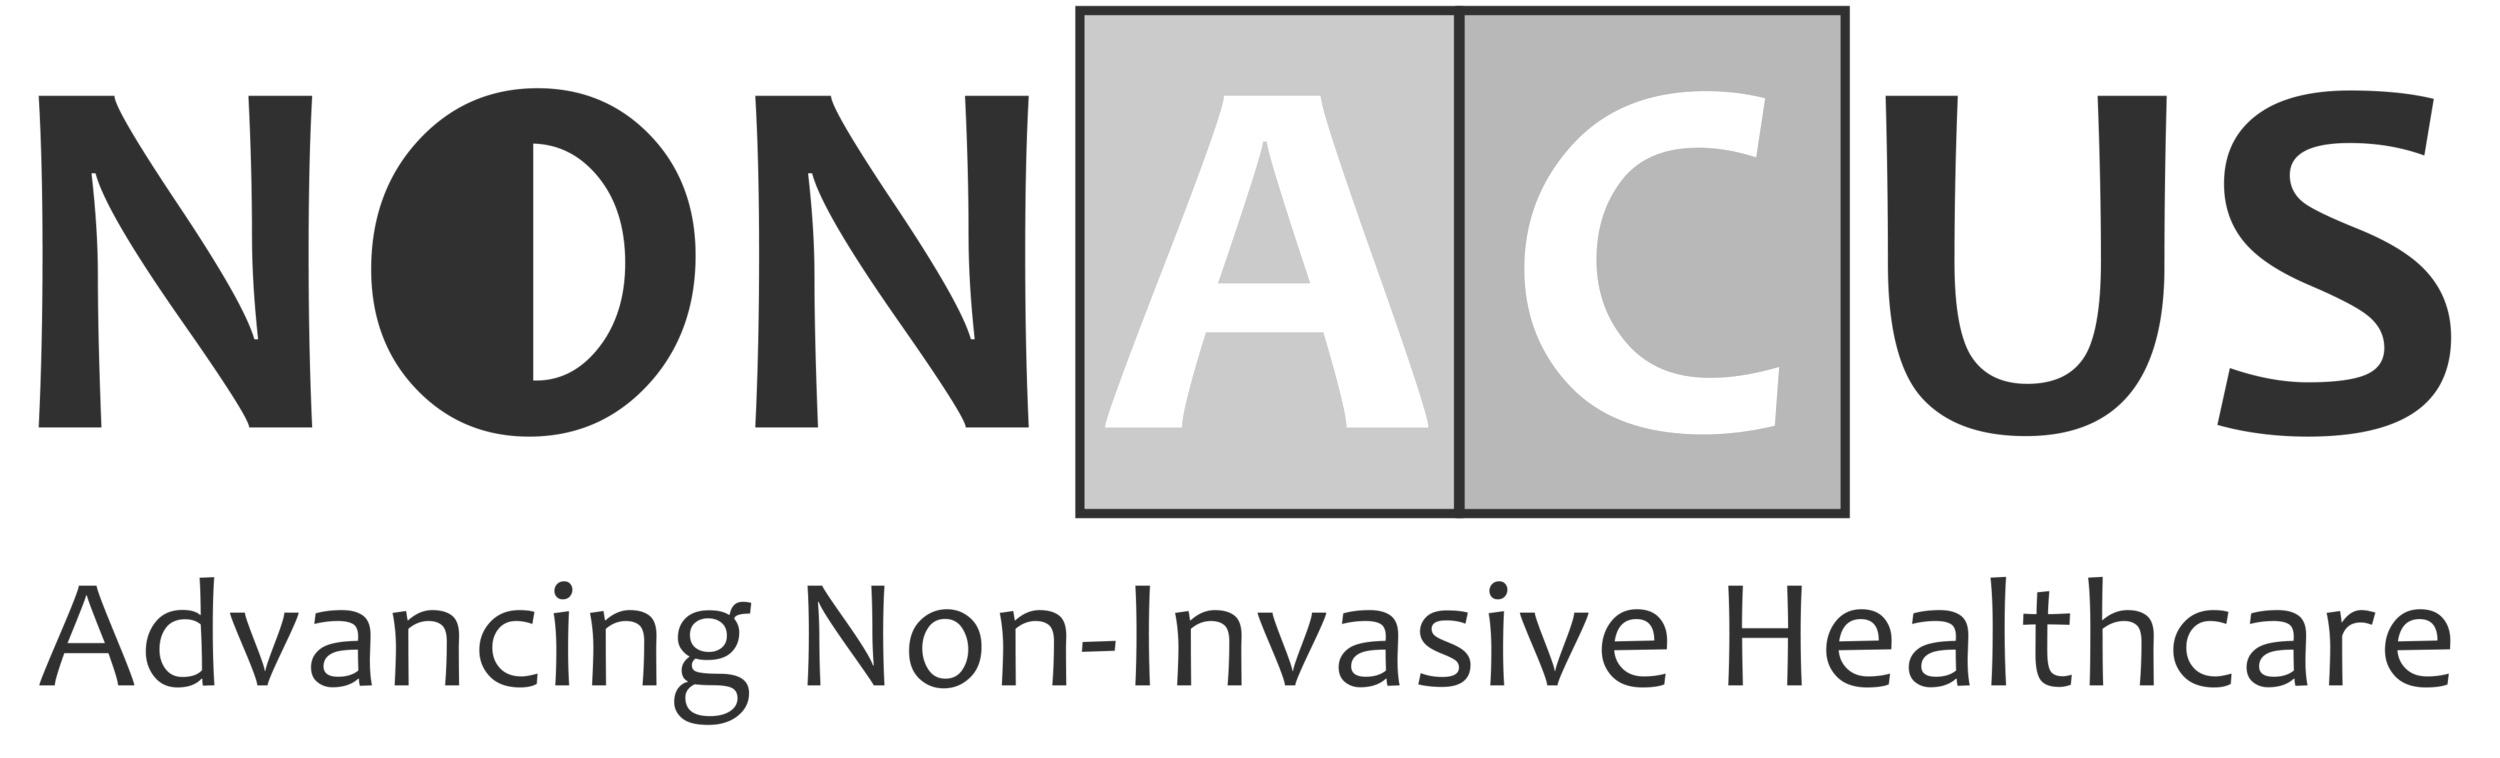 Nonacus+logo+Tagline.jpg